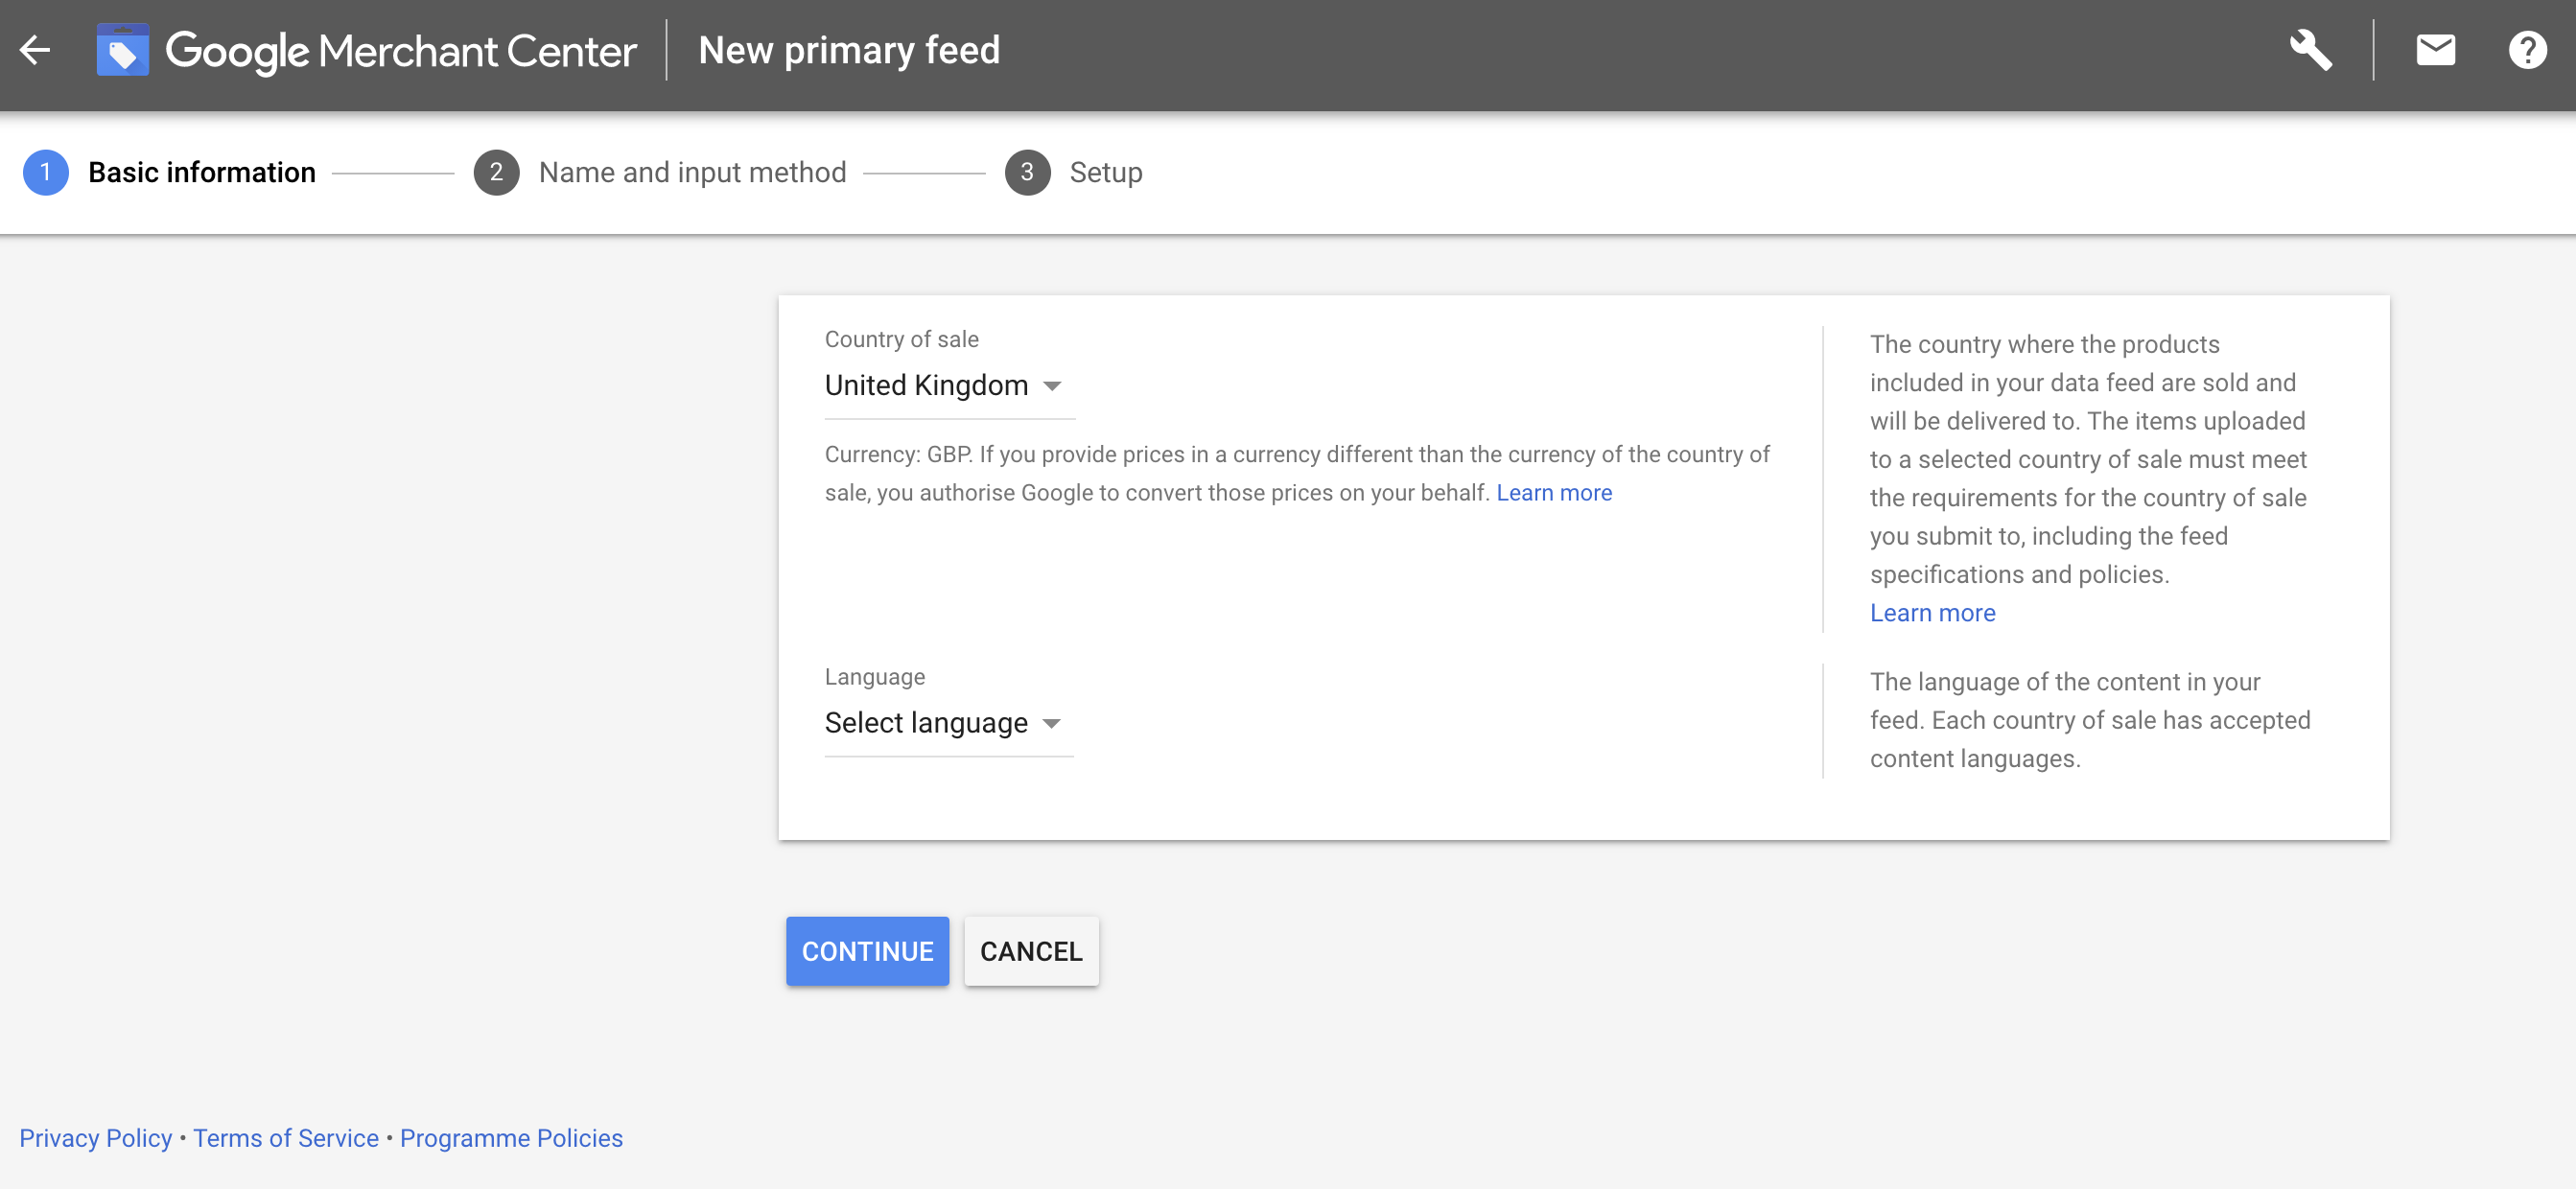 Google New primary feed